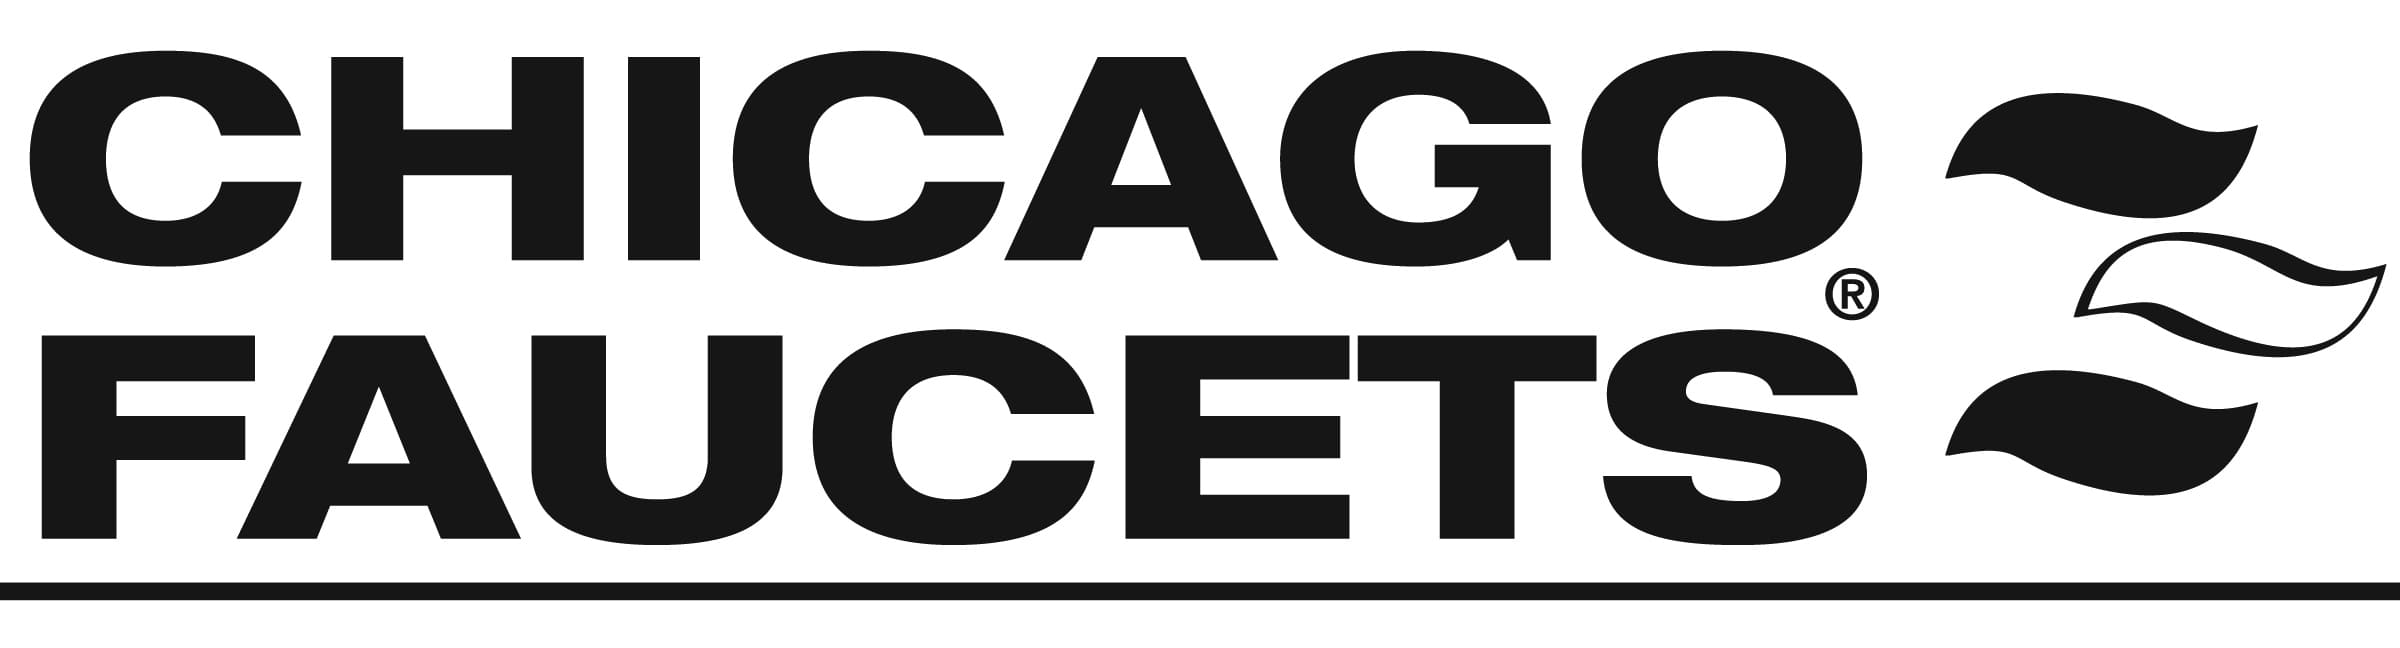 Visit Chicago Faucets Website